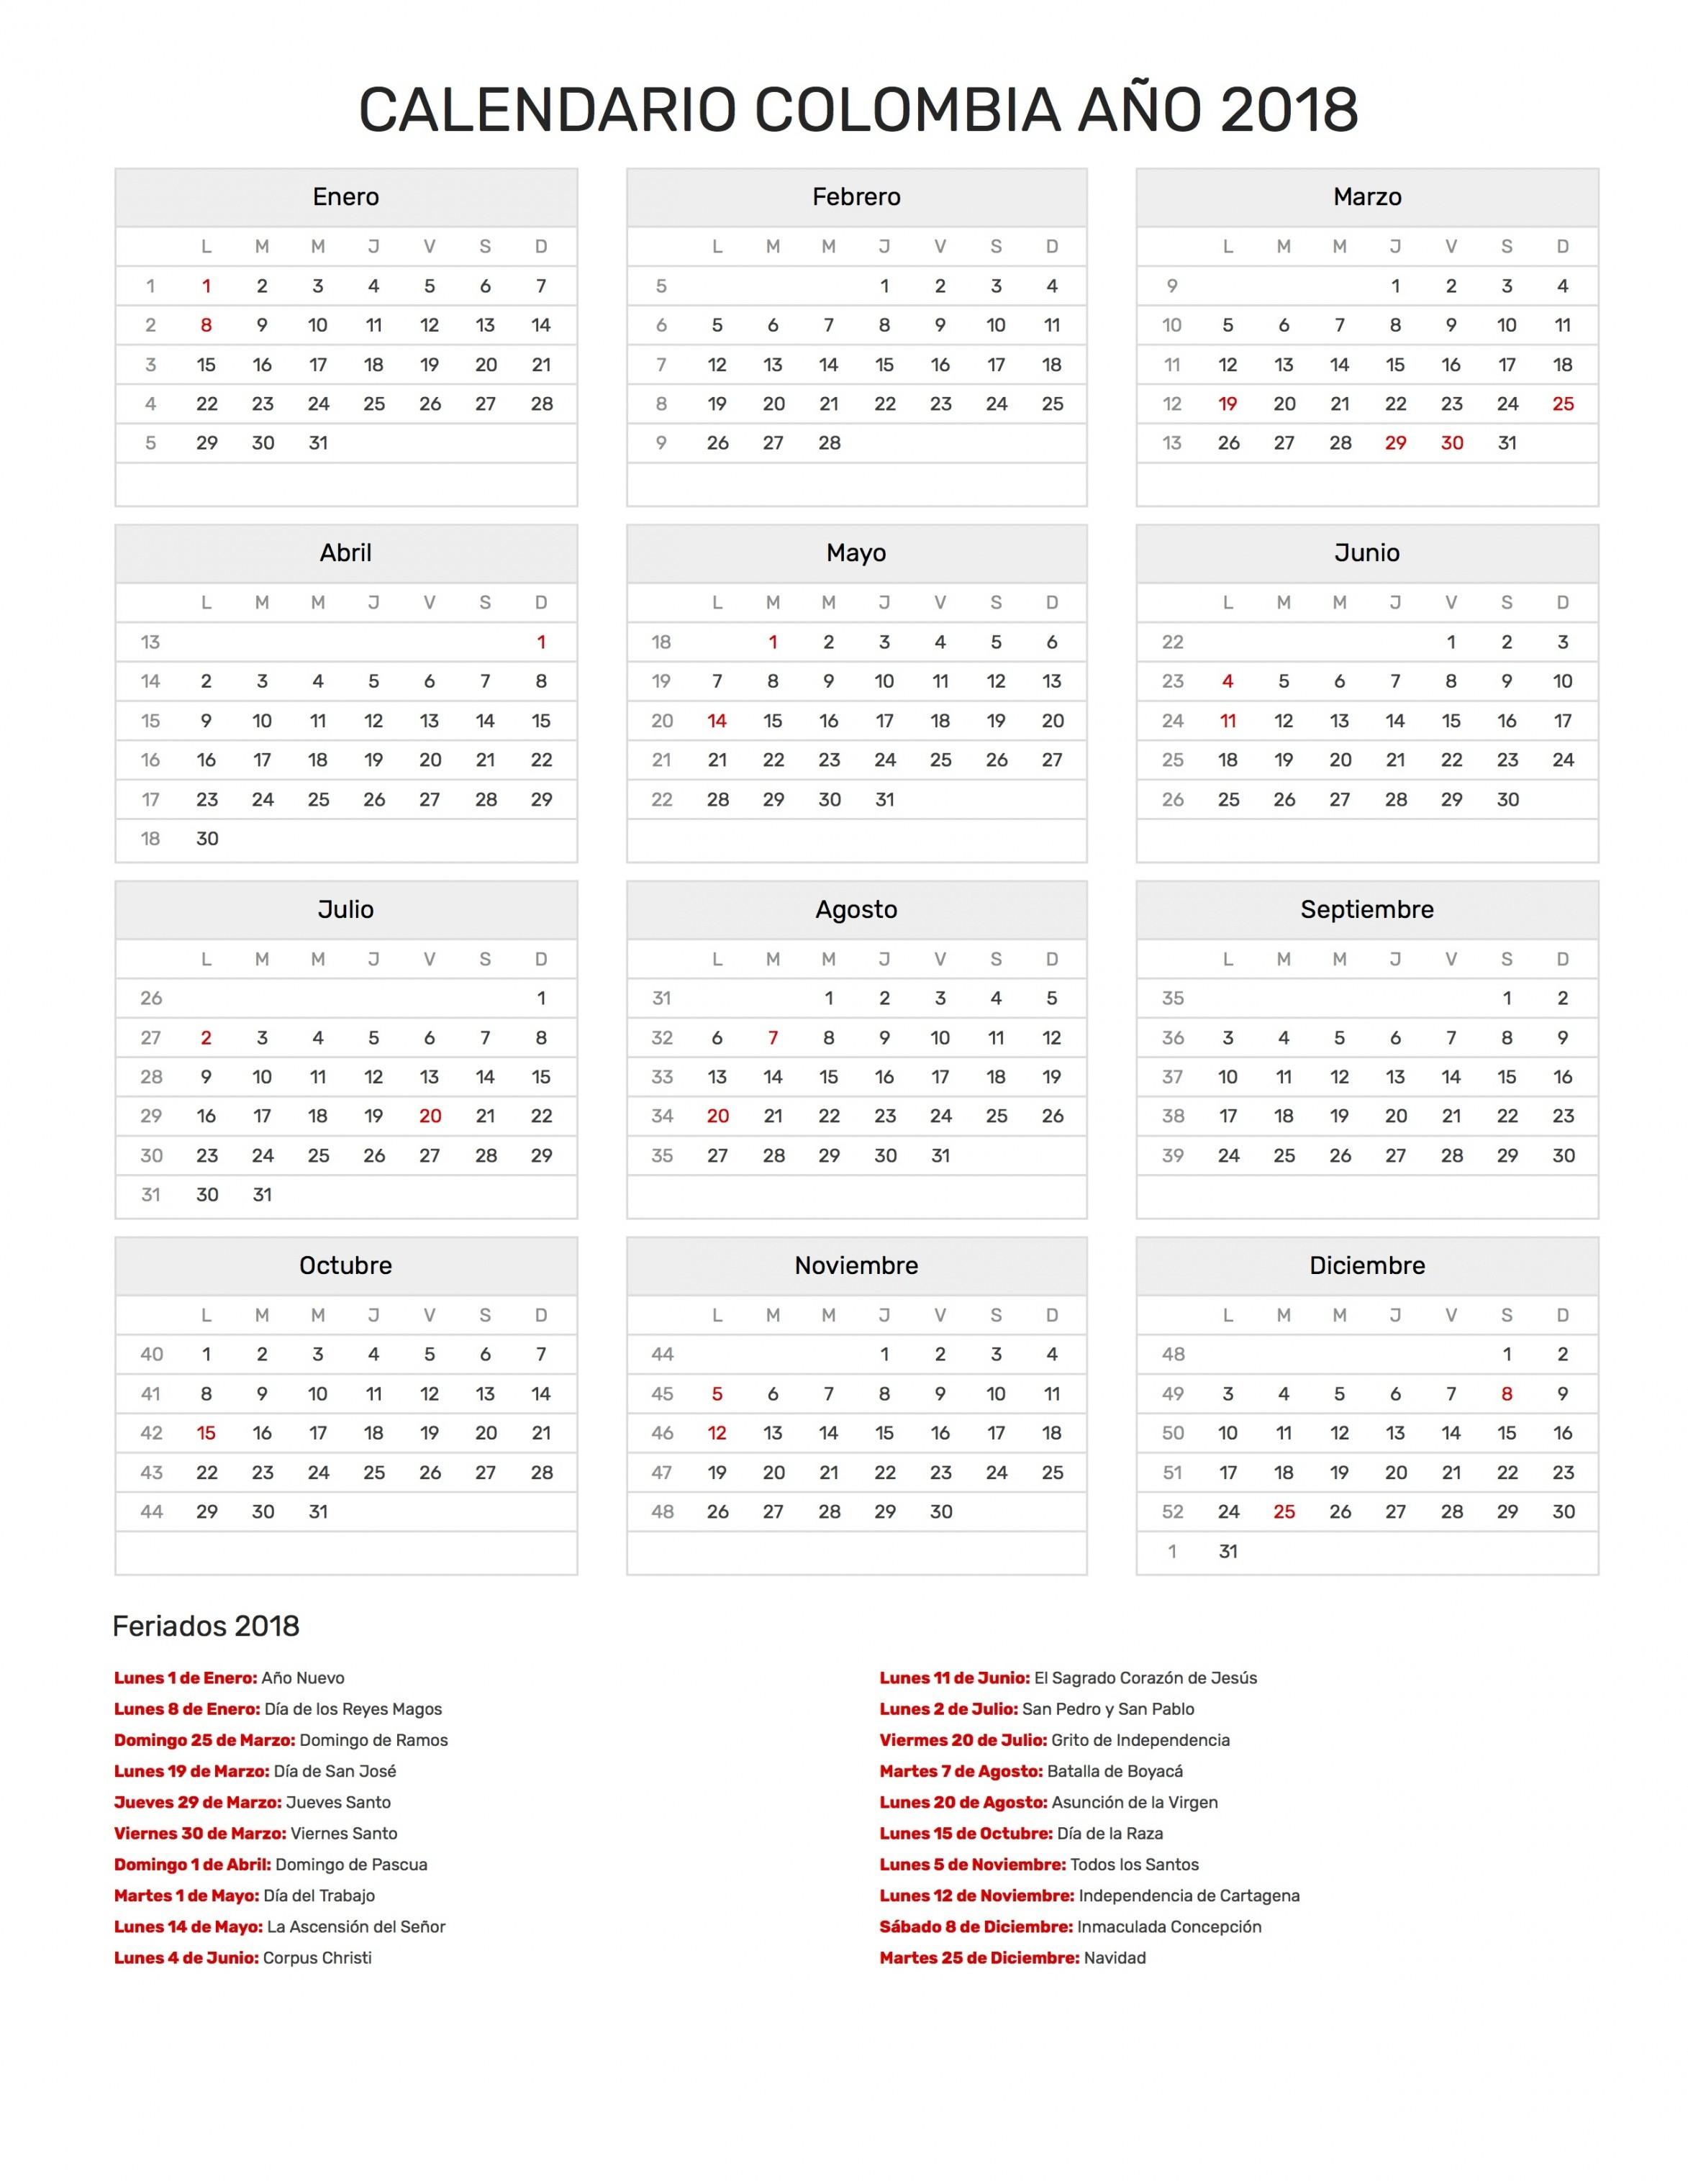 Calendario Febrero 2019 Dias Festivos Más Arriba-a-fecha Calendario 2018 Con Festivos — Fiesta De Lamusica Medellin Of Calendario Febrero 2019 Dias Festivos Más Recientes Investigar Descargar Calendario 2019 En Excel